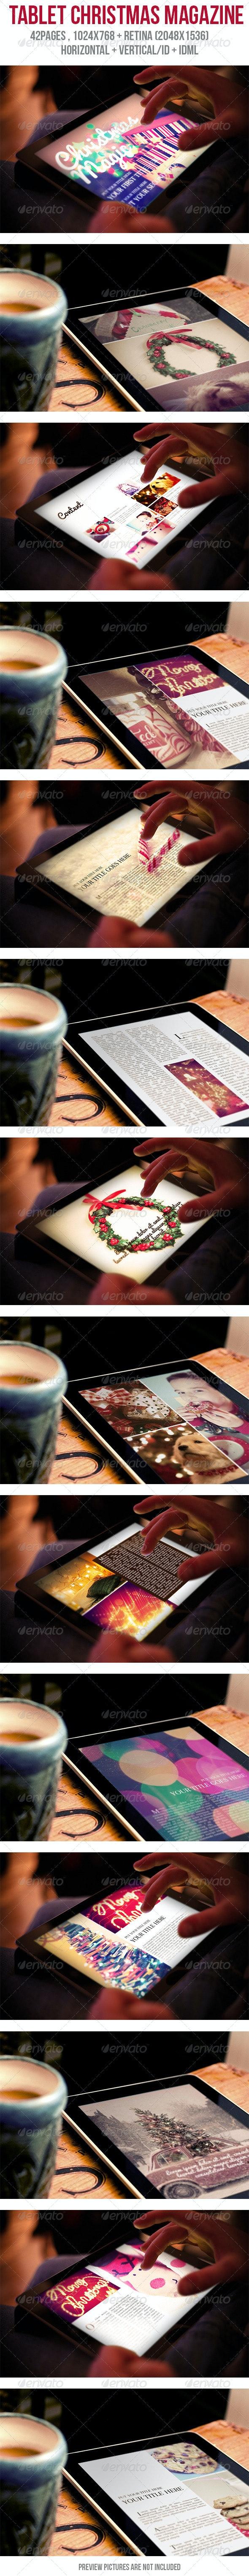 iPad & Tablet Christmas Magazine